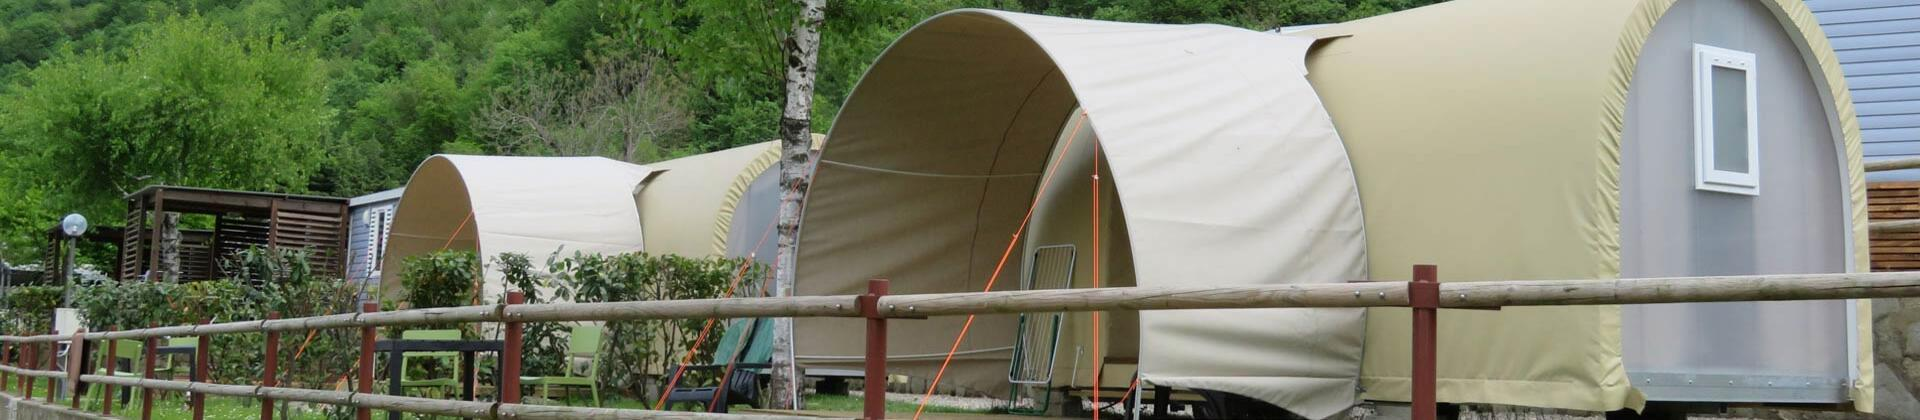 campingdarna it coco-sweet-tent 013